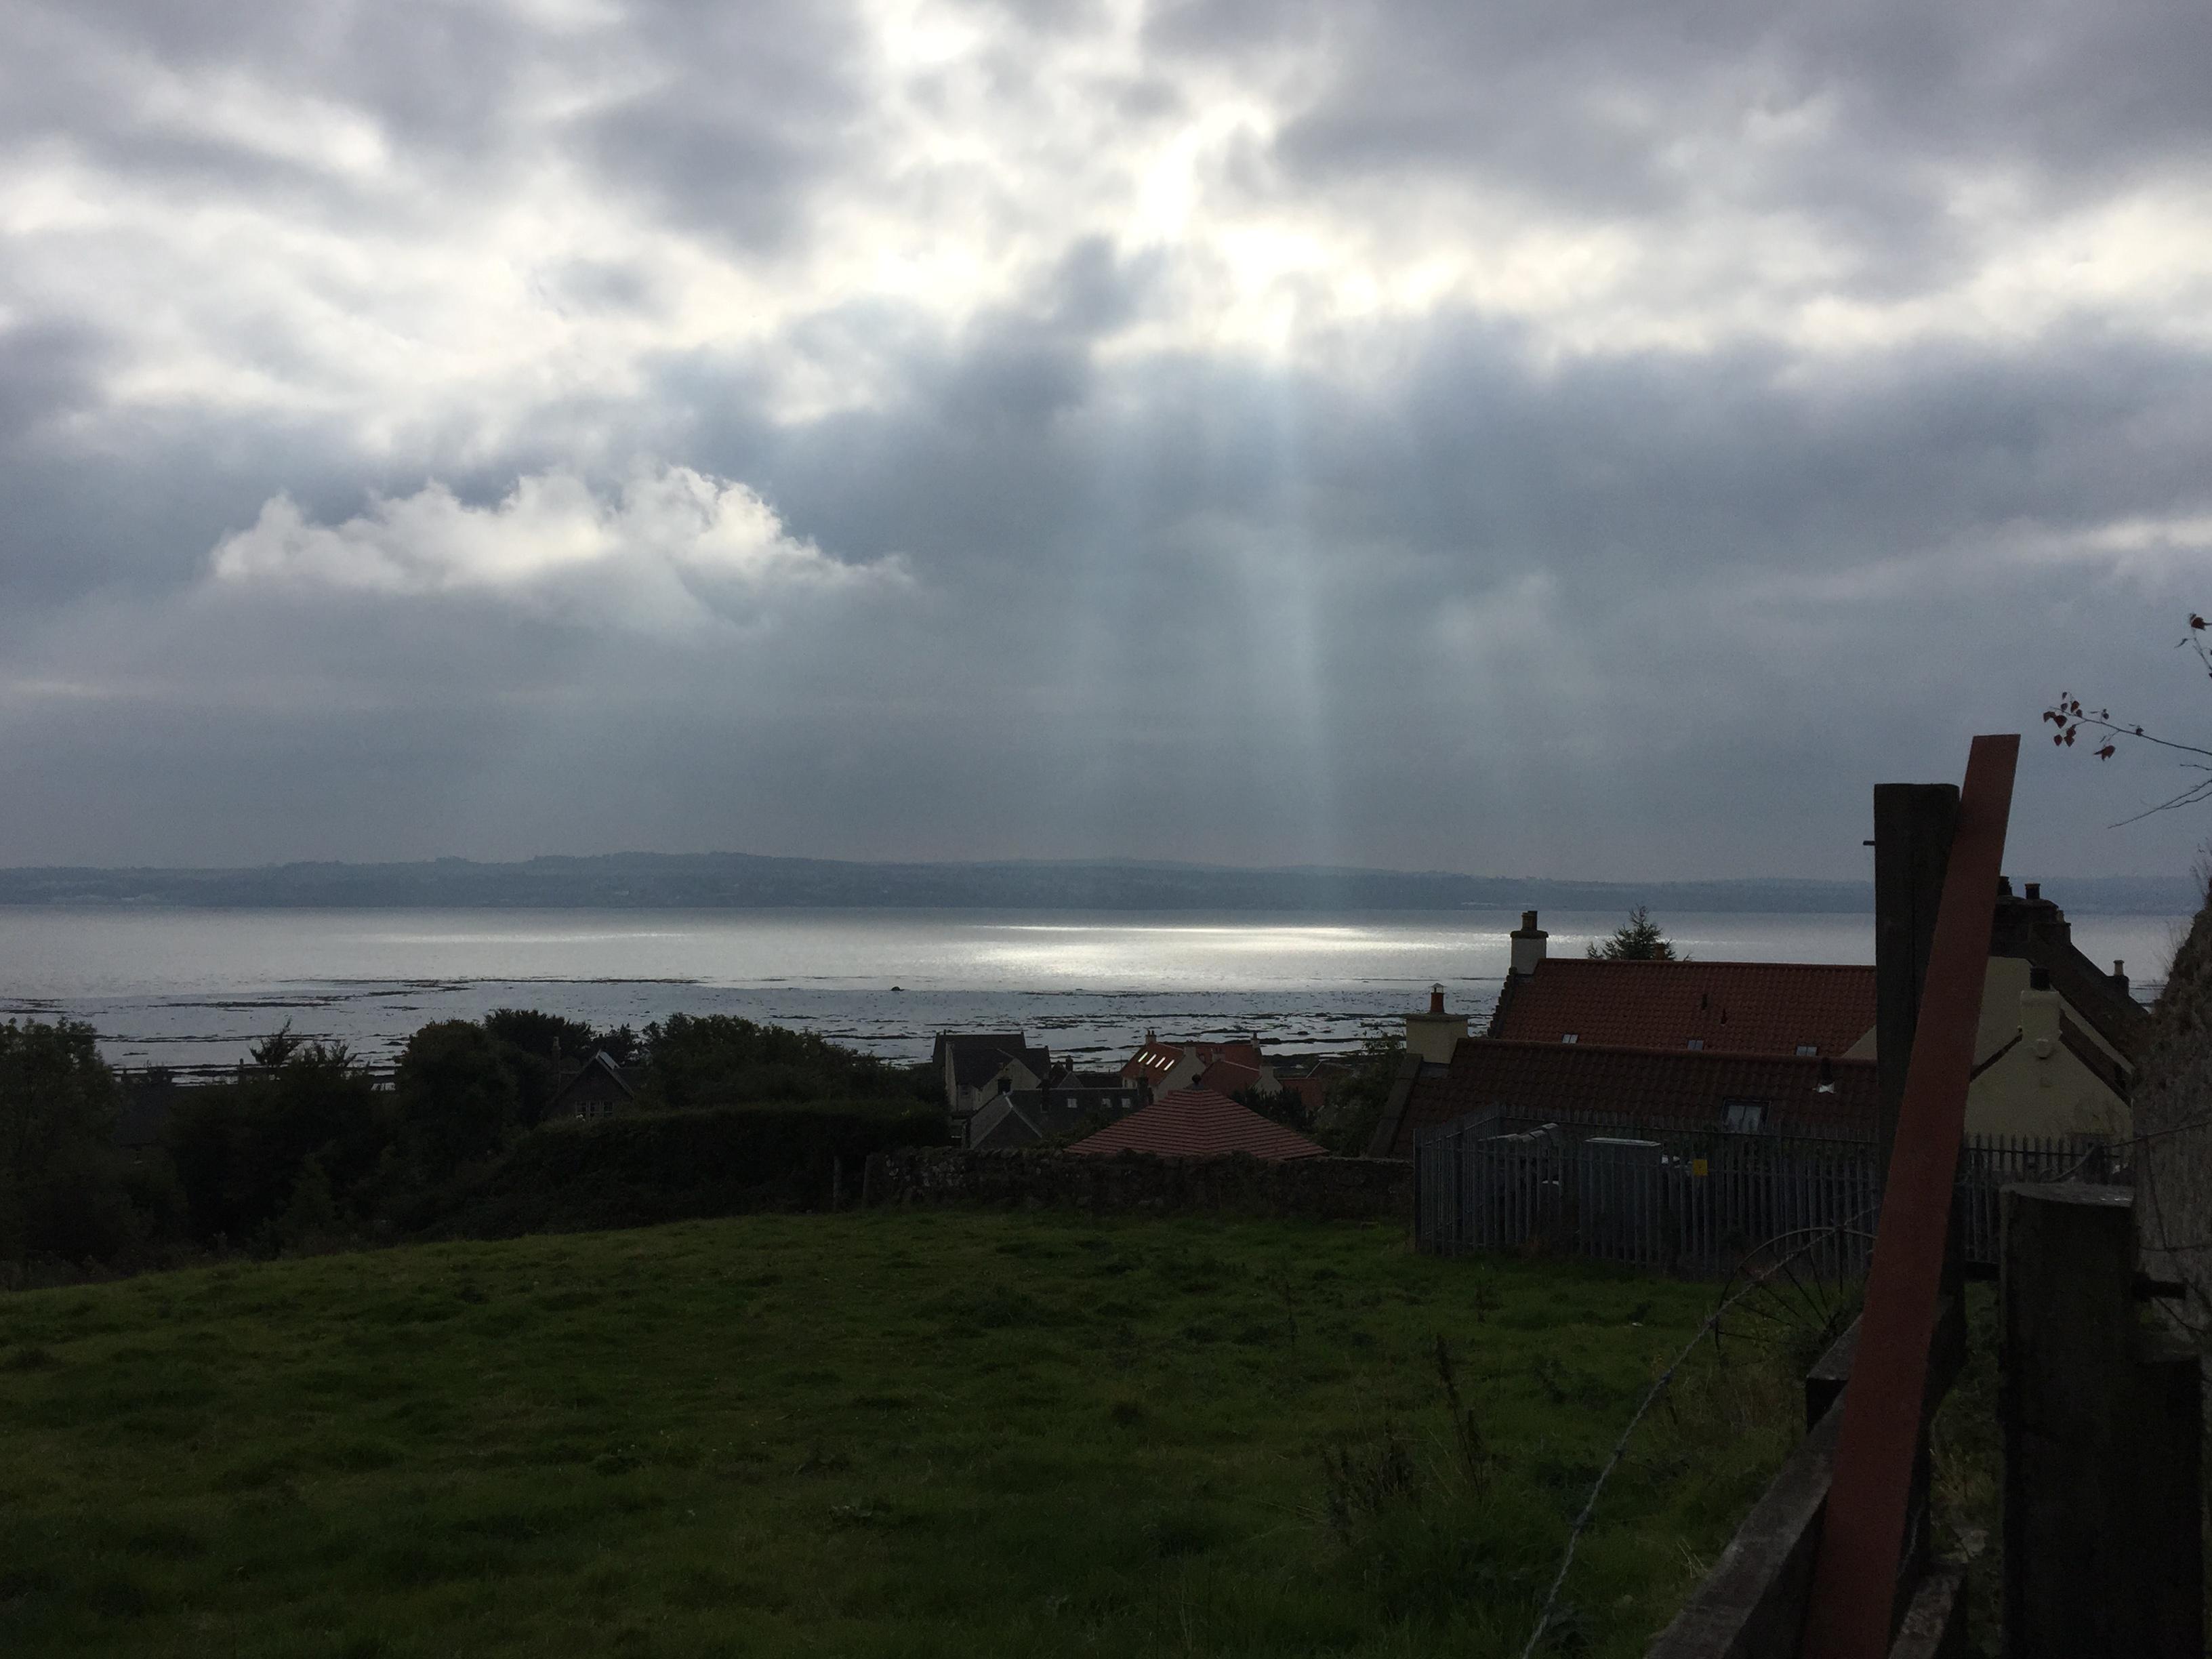 Sunlight shining on the water through clouds near Culross, Scotland.